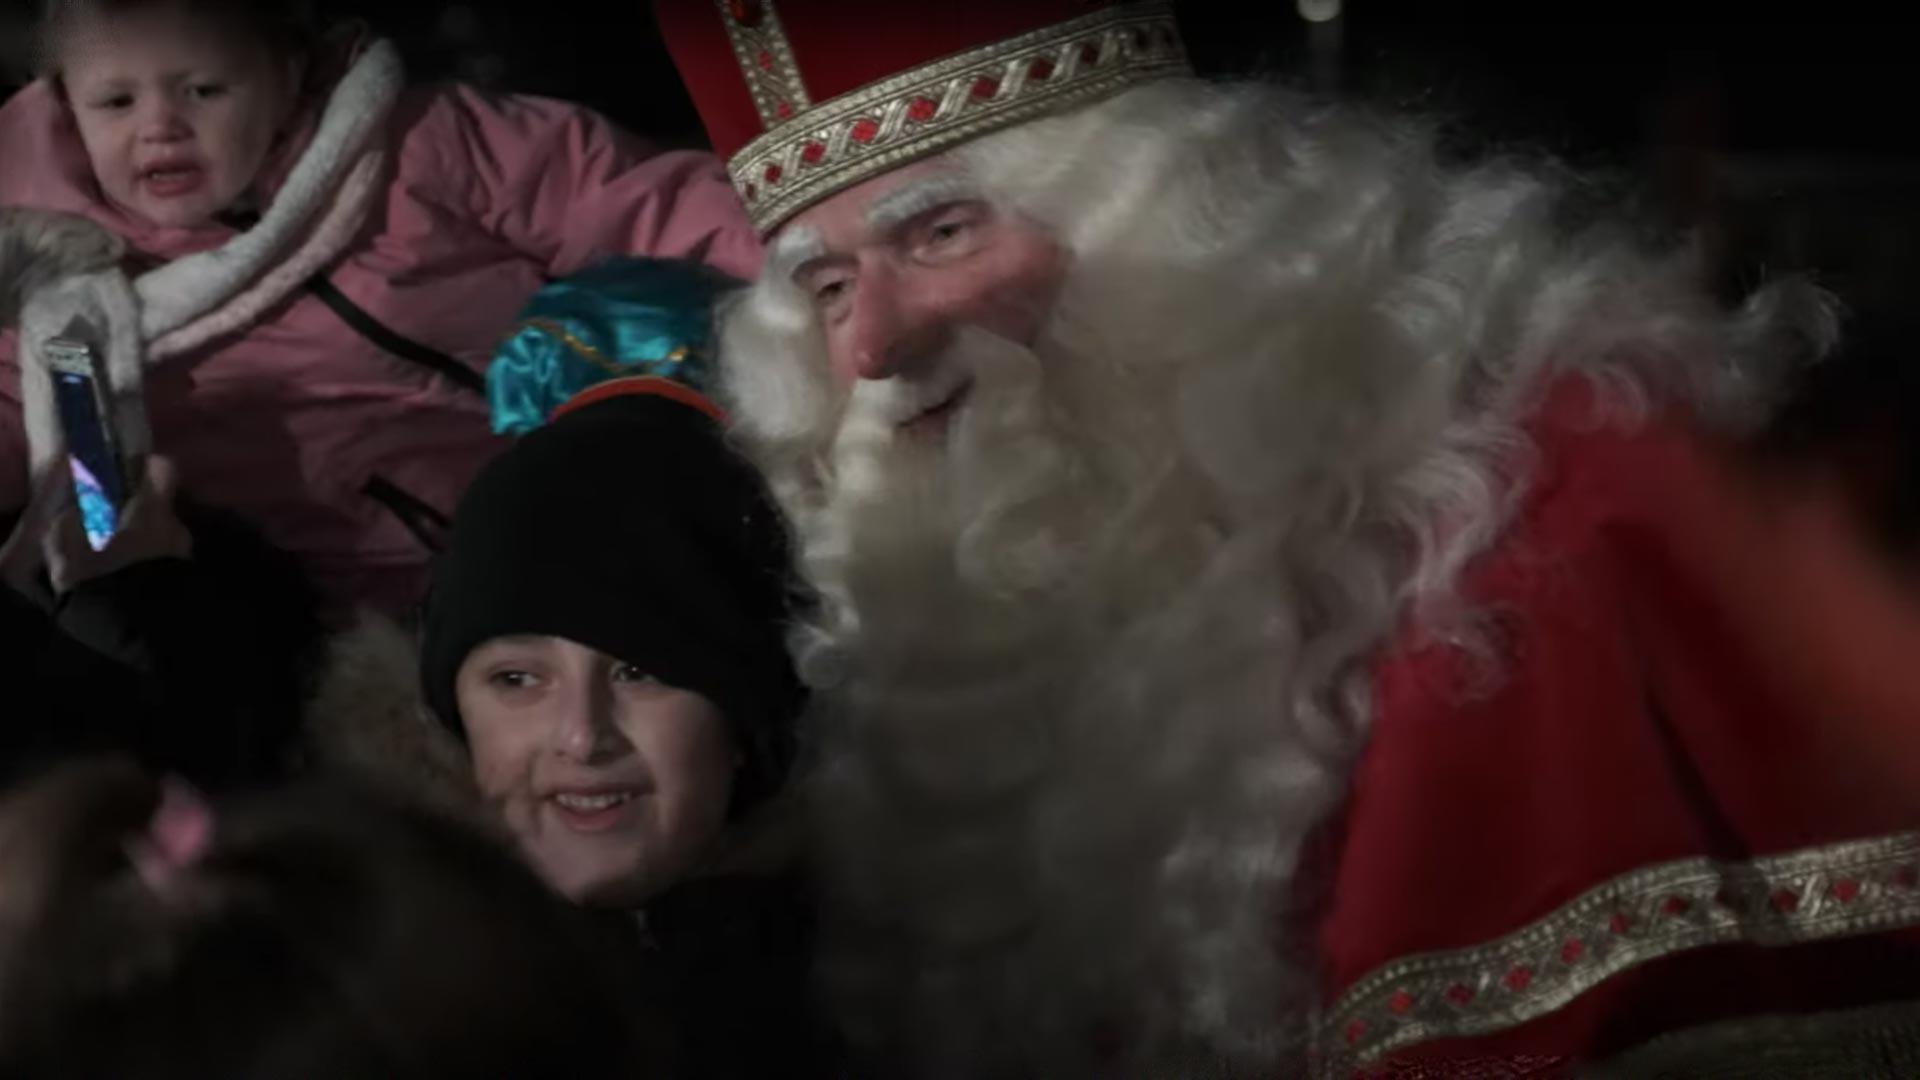 Sinterklaas in Beverwijk aftermovie thumbnail